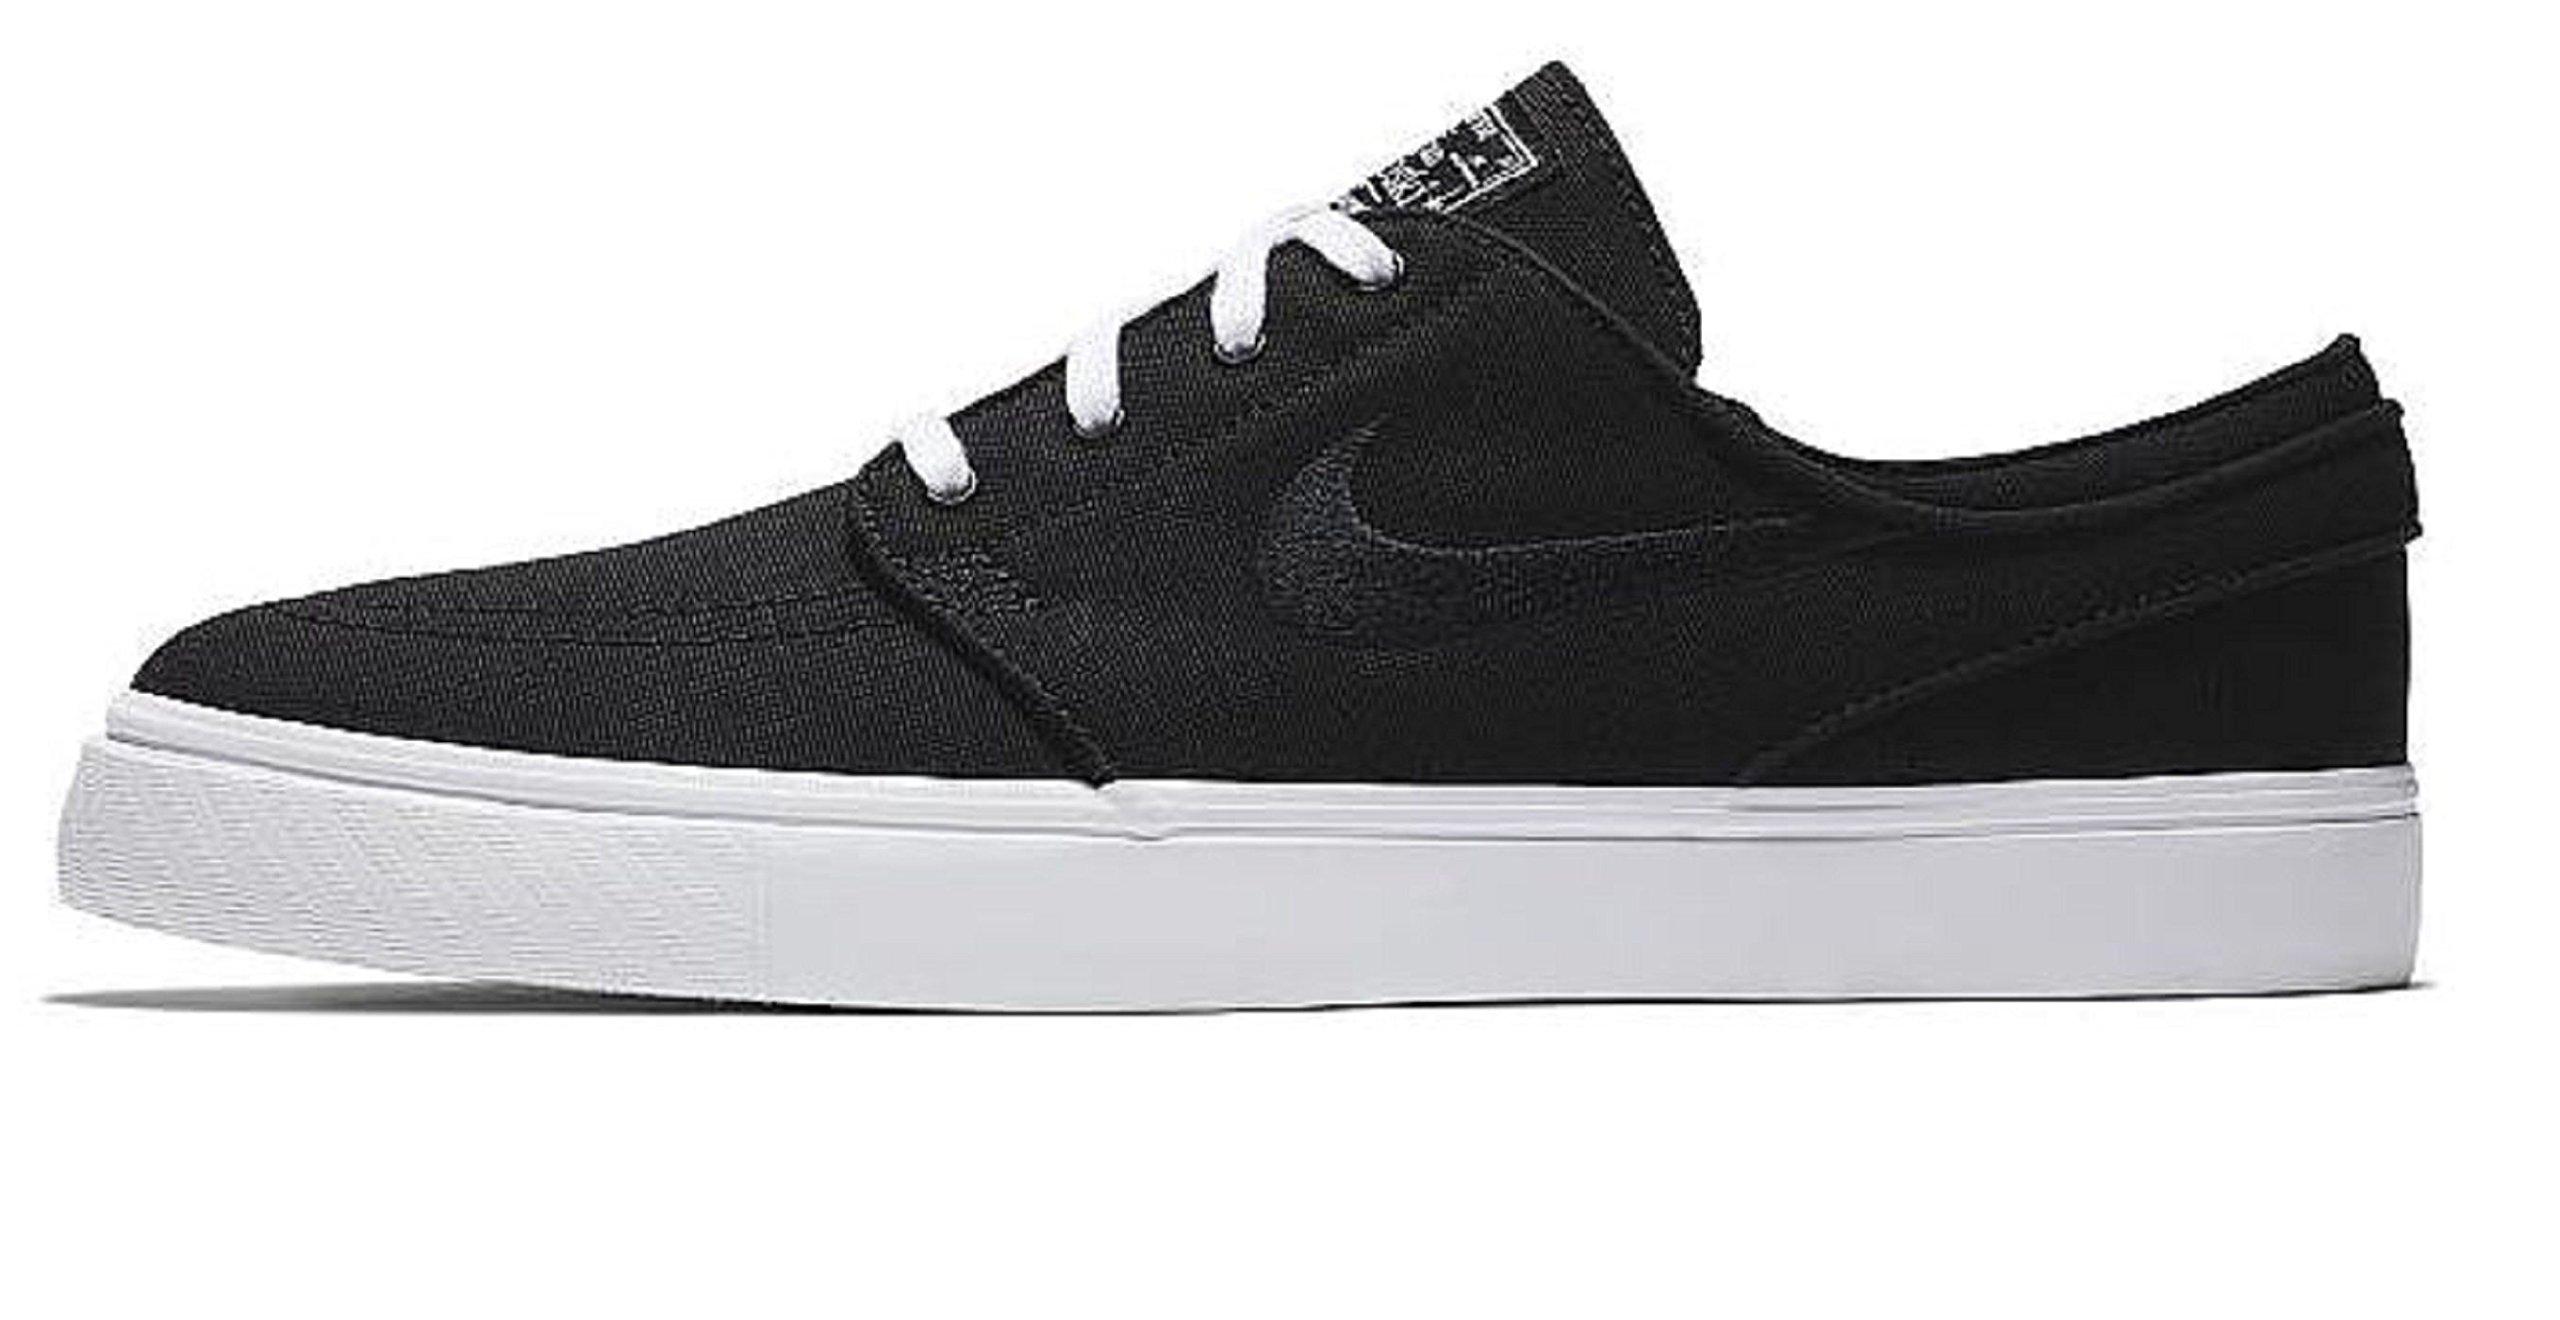 newest 82288 9cfef Galleon - NIKE Zoom Stefan Janoski CNVS Mens Skateboarding-Shoes  615957-022 11.5 - Black Black-White